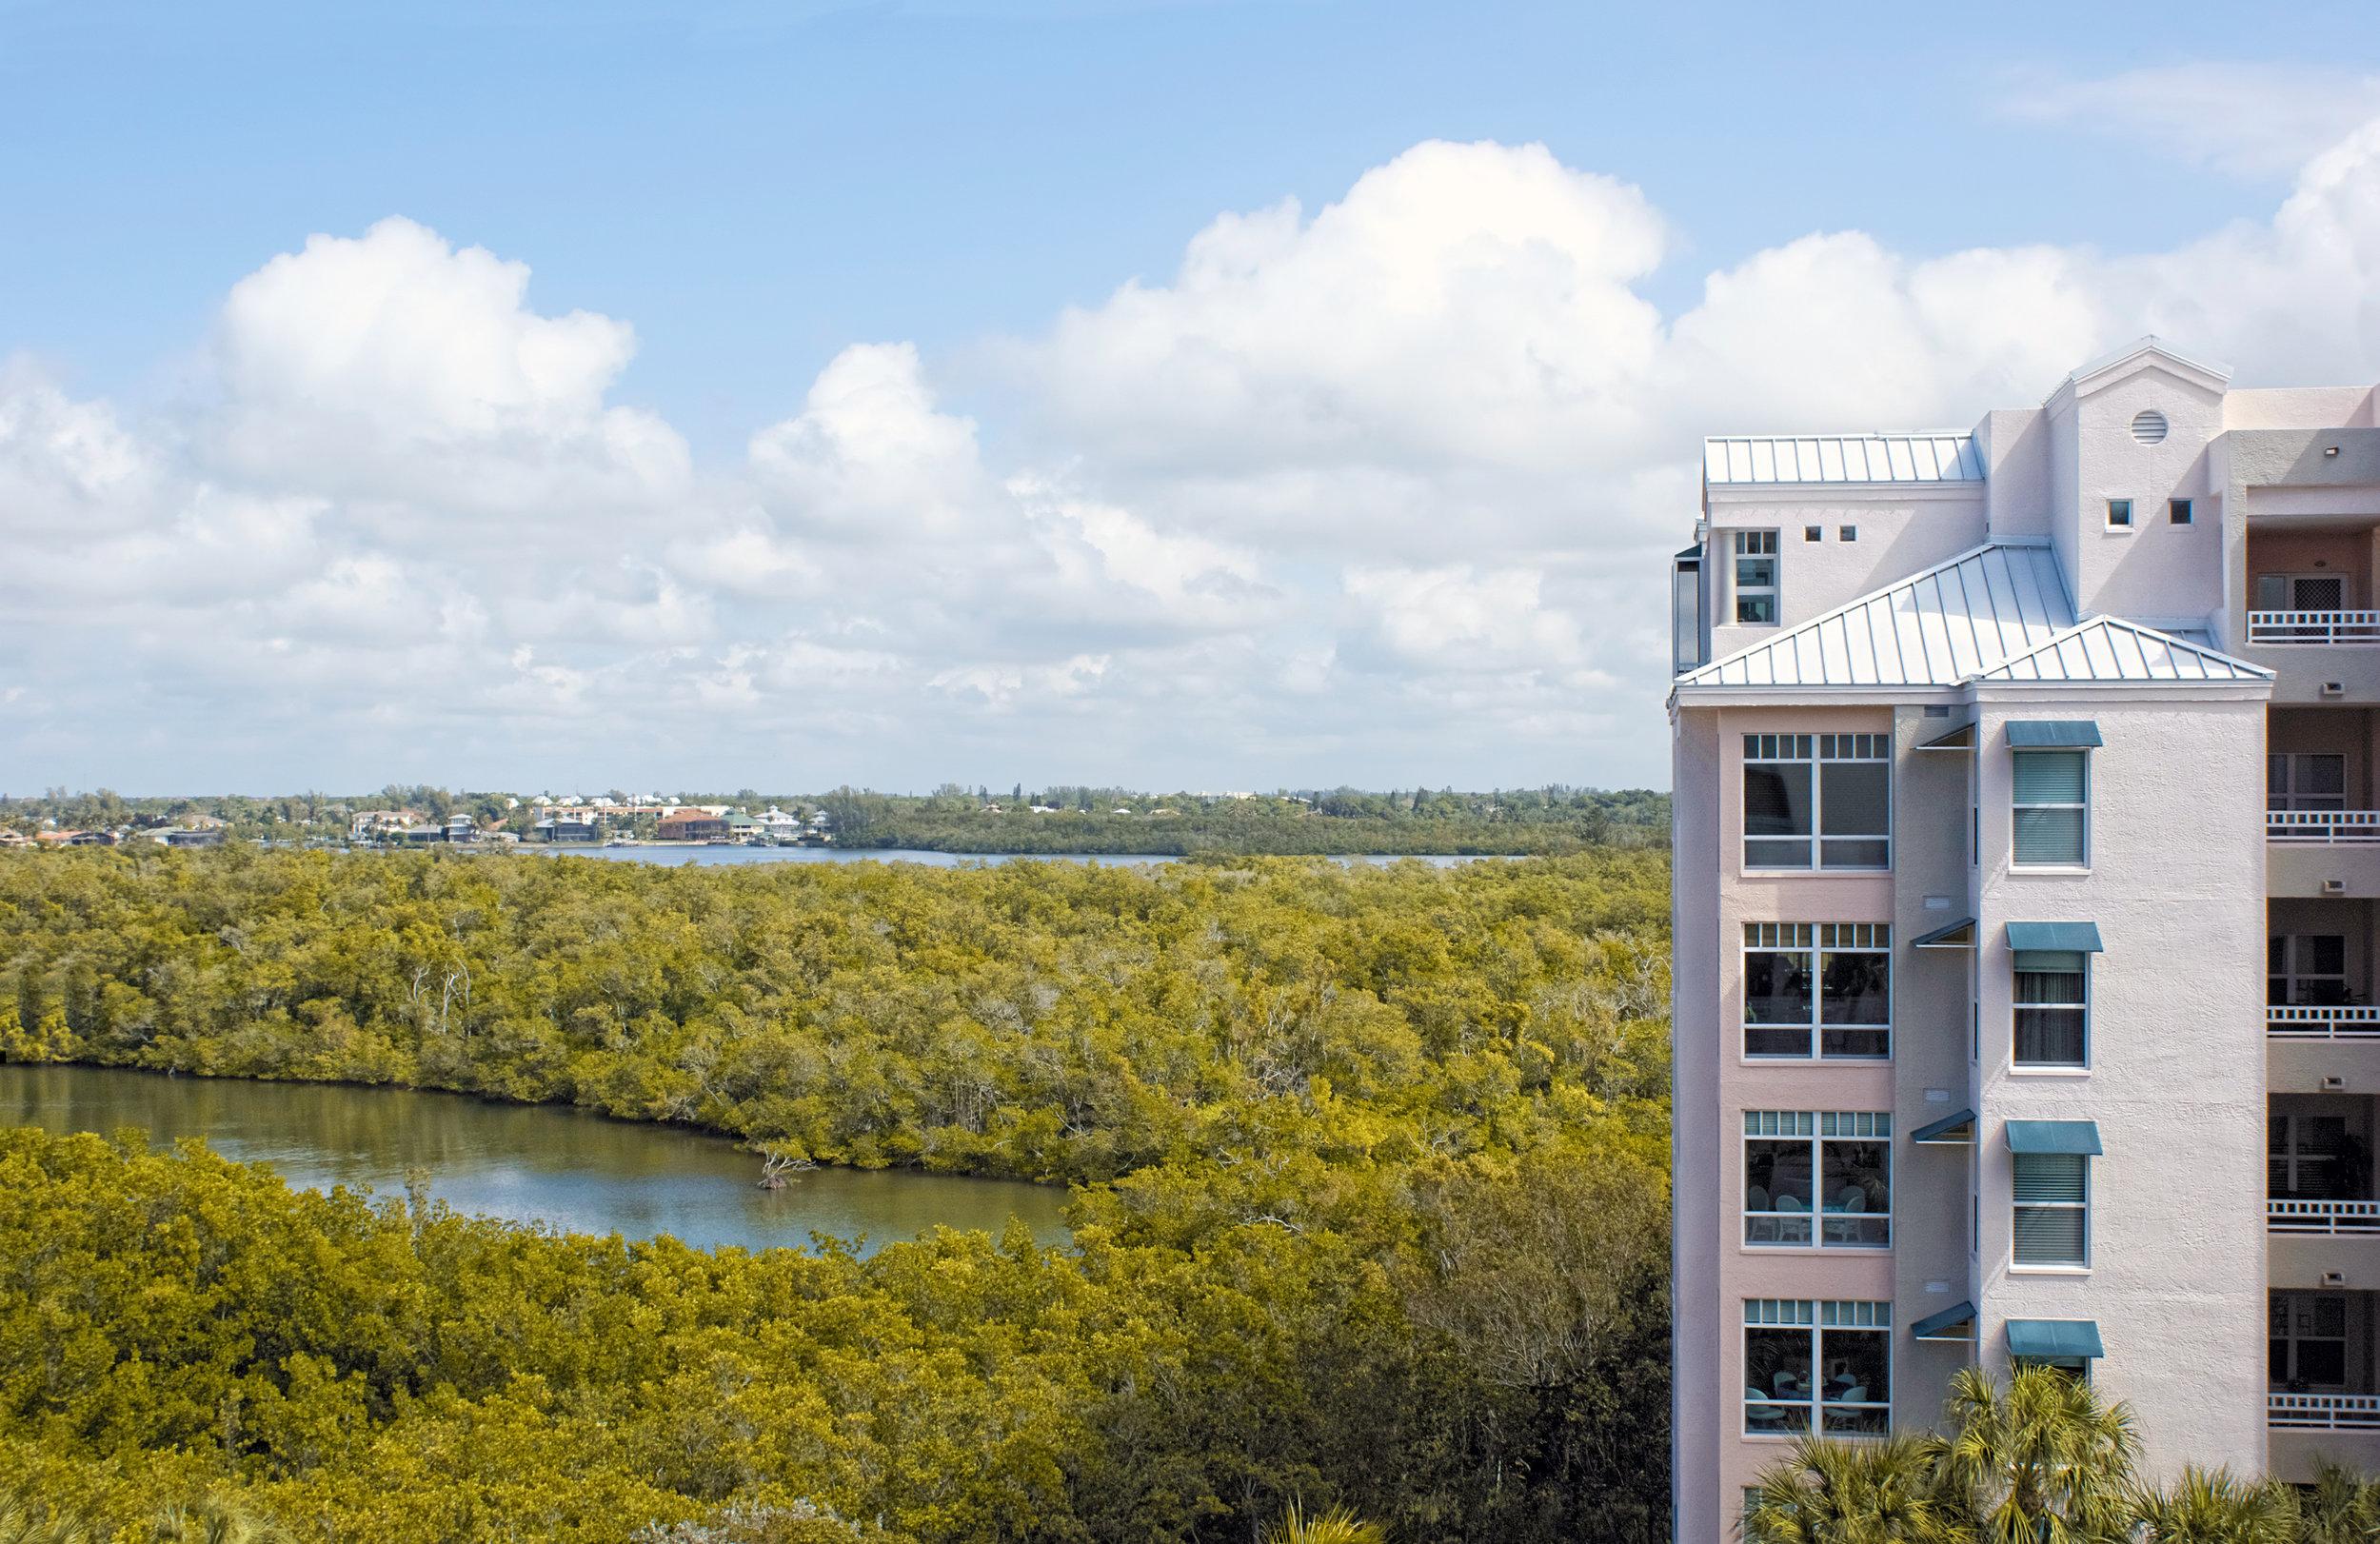 Joe-the-Home-Pro-Bonita-Springs-Florida-Condominium-Overview-photo